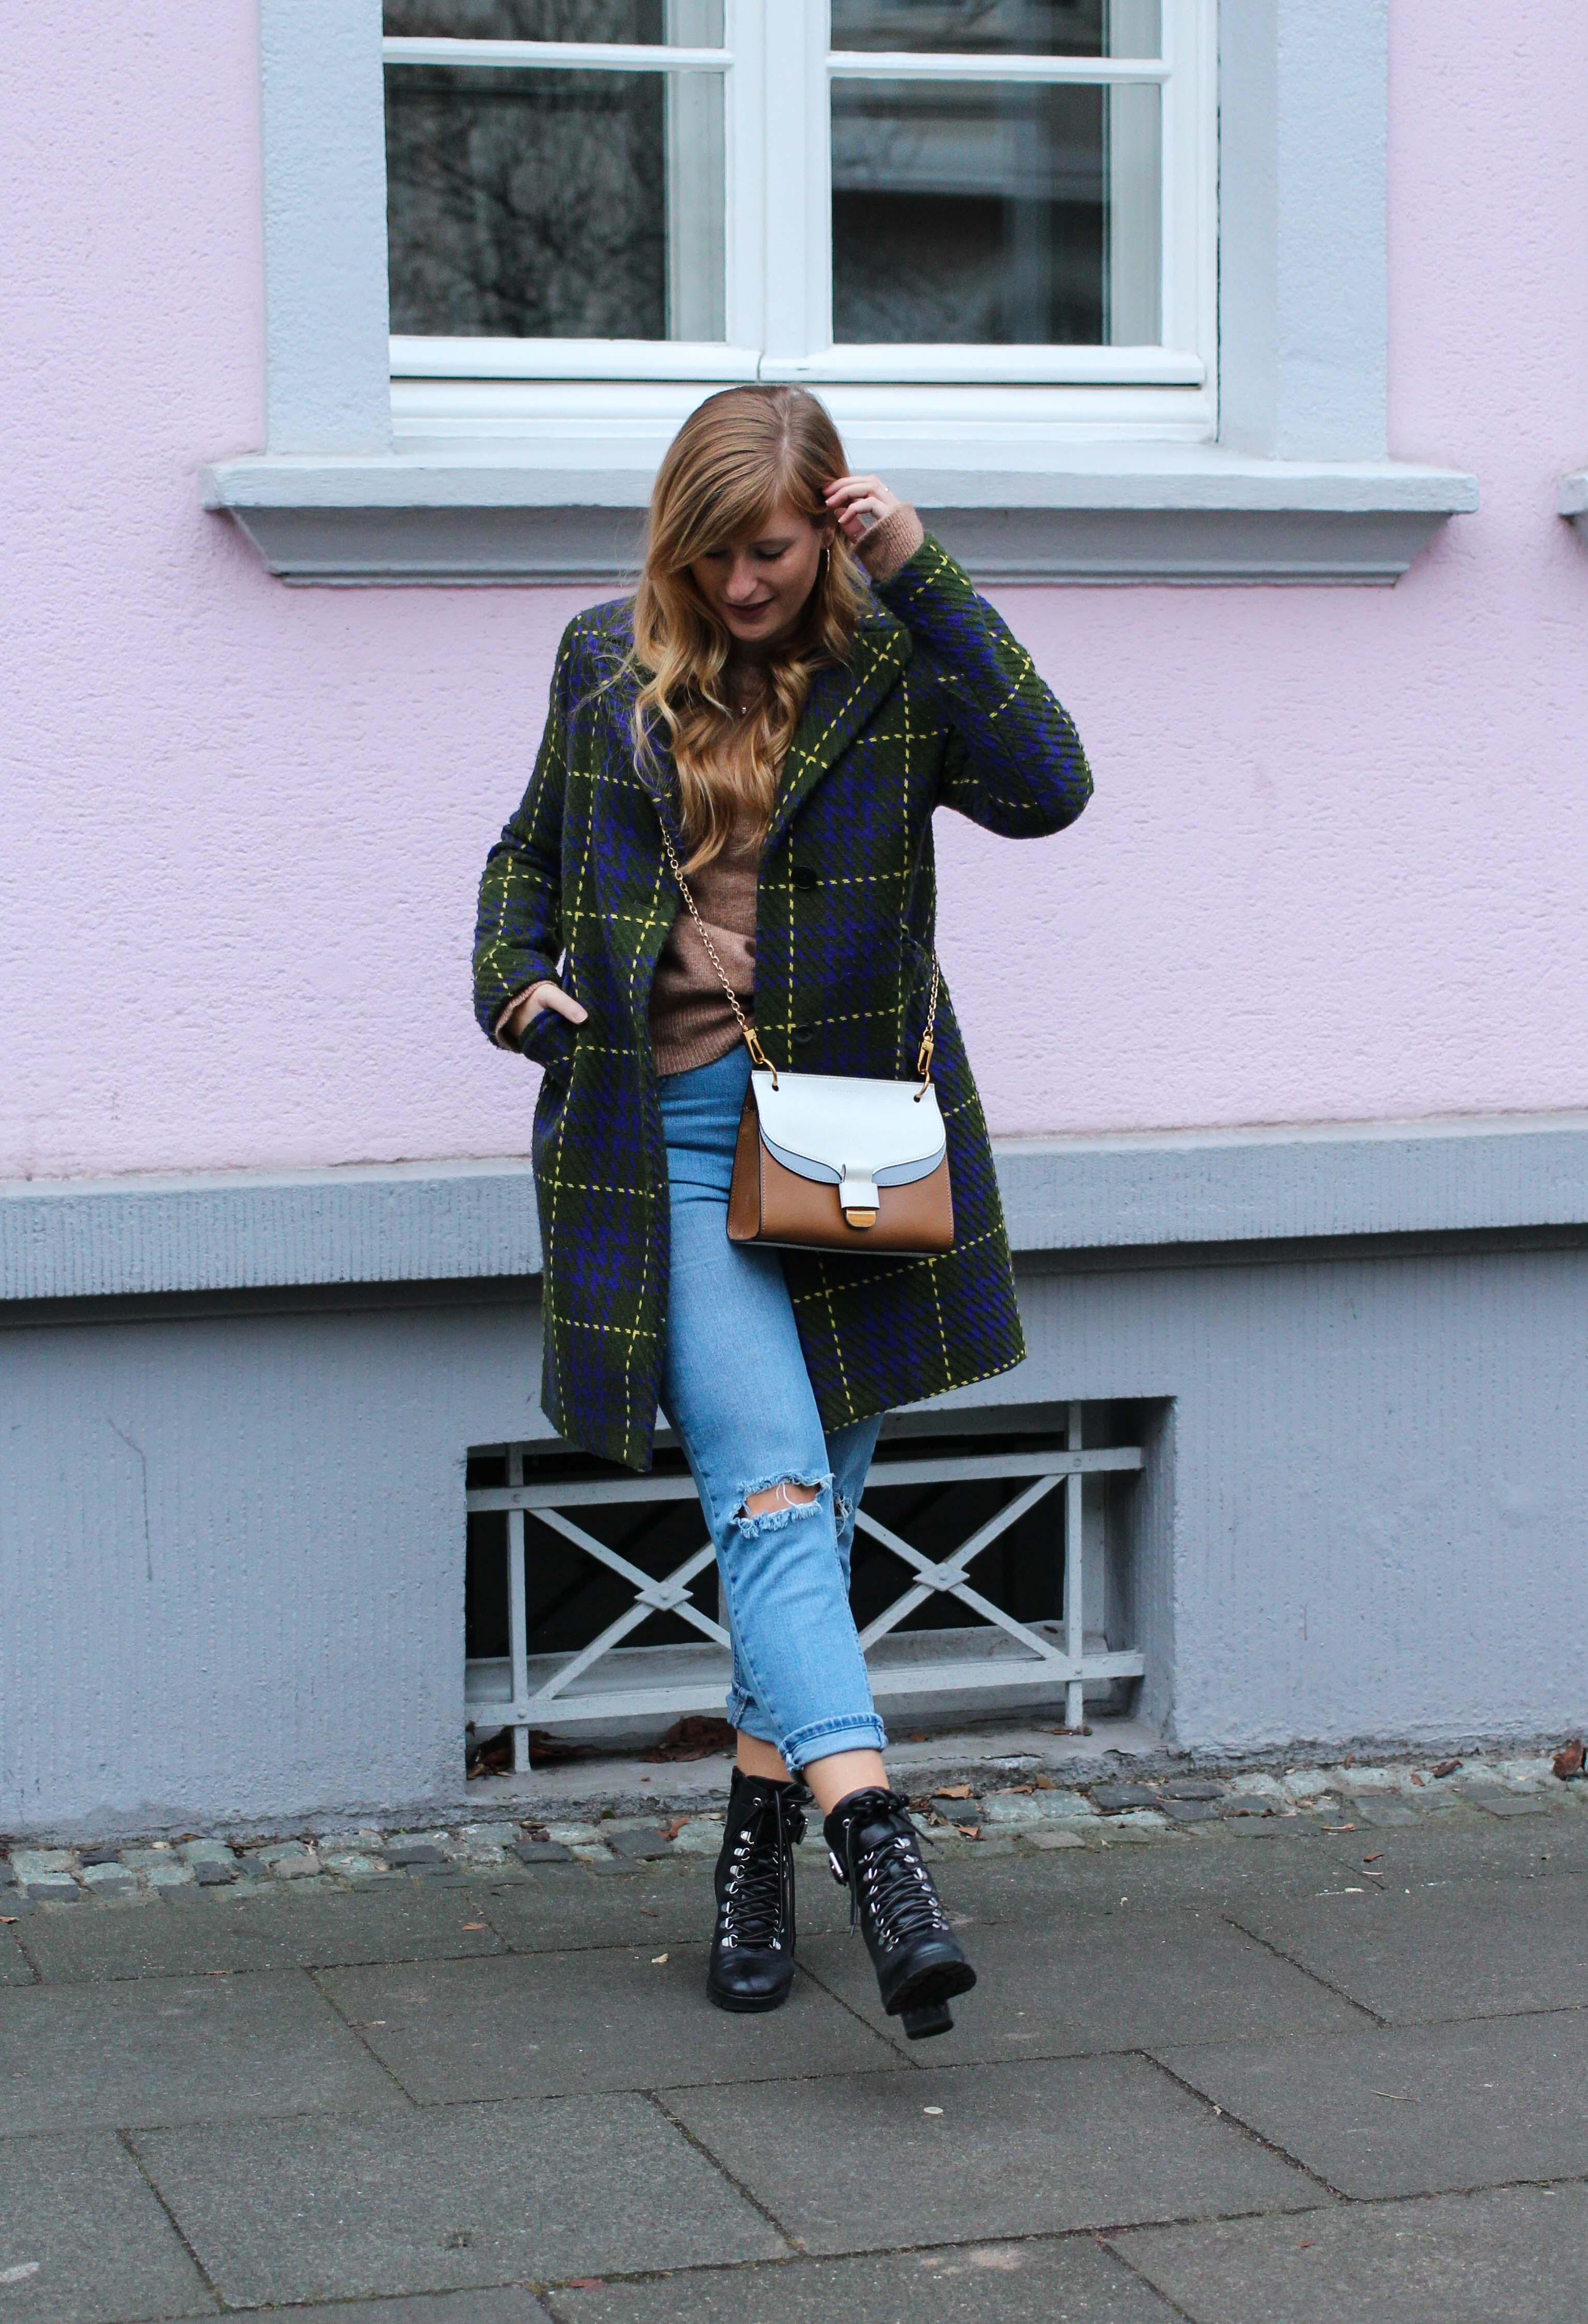 Herbst Must-Have 2019 Karomantel. Herbstmode Herbsttrend Mantel karriert Modeblog Outfit Herbst Fashion Blog Bonn 7